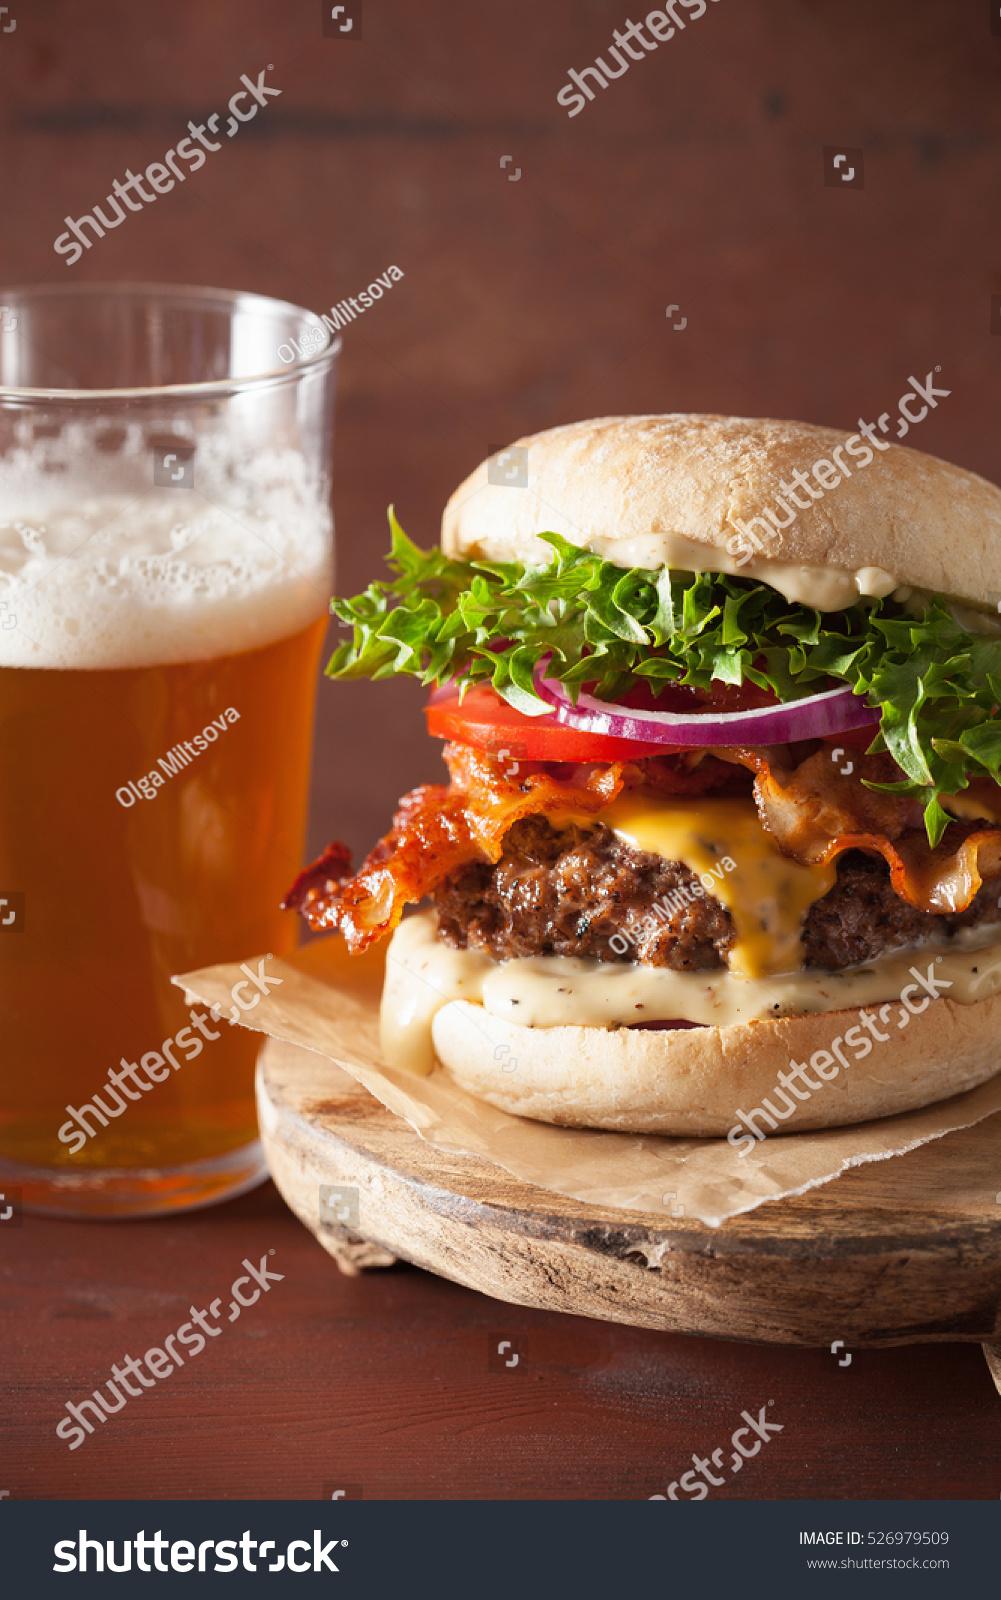 Bacon Cheese Burger Beef Patty Tomato Stock Photo 526979509 ...